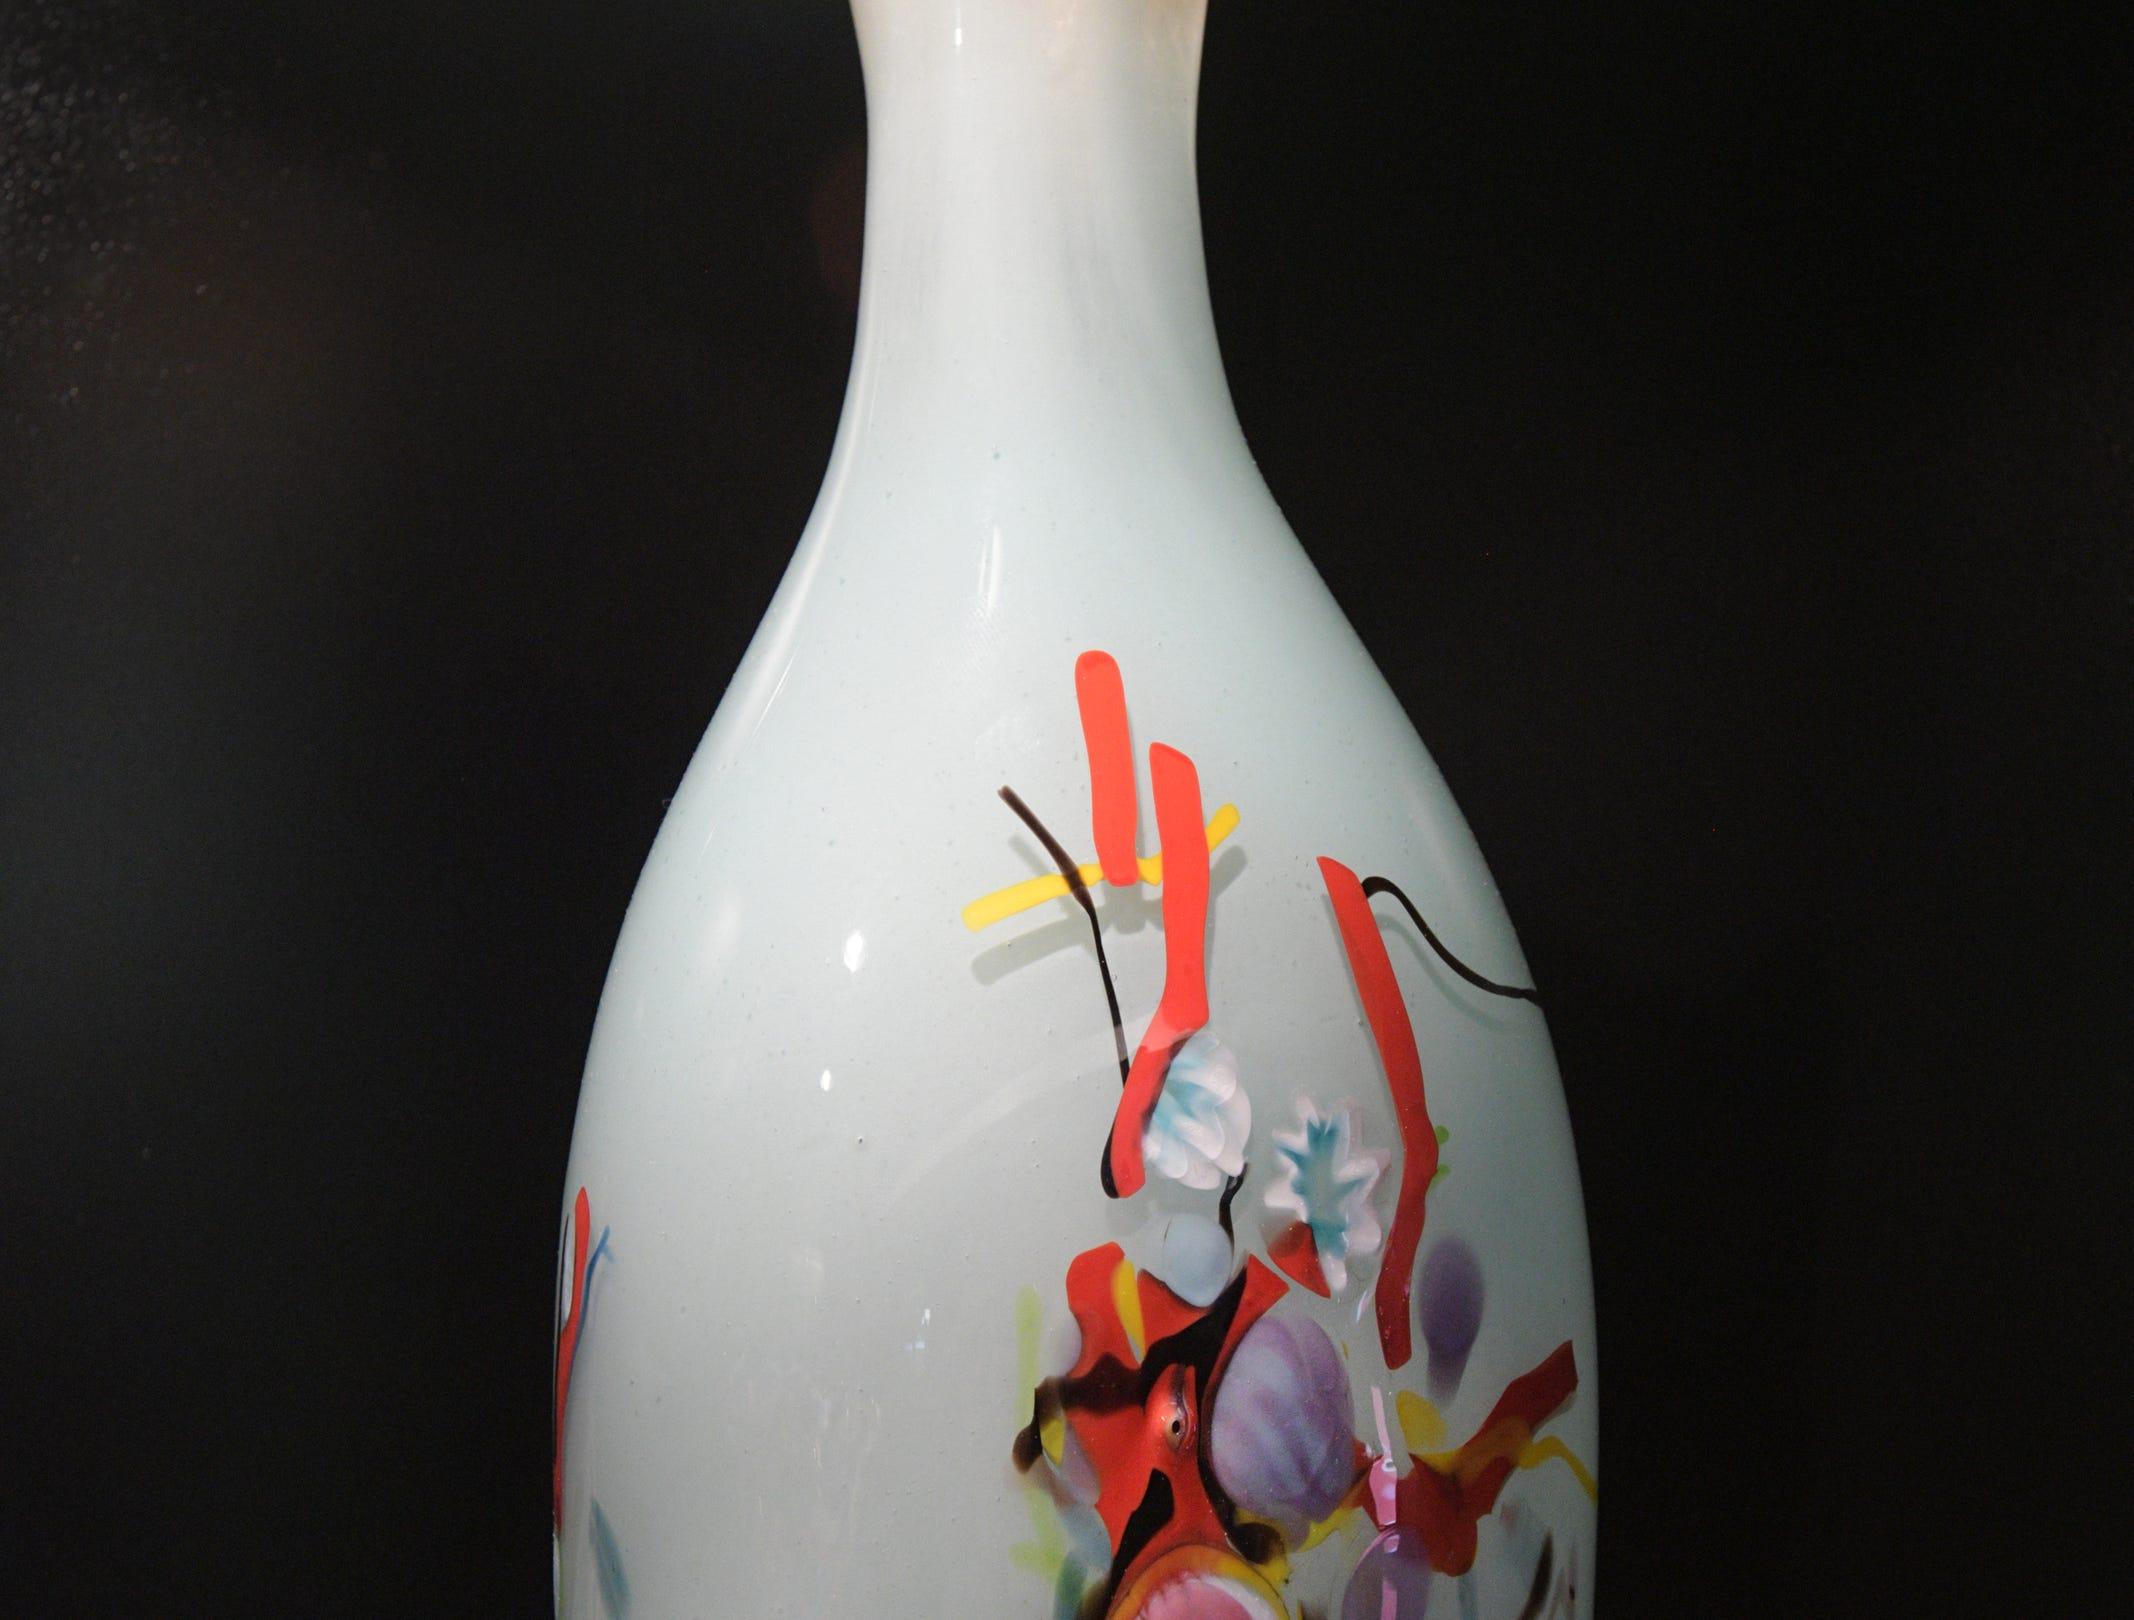 Glass Art created at Sanctuary Glass Studio.